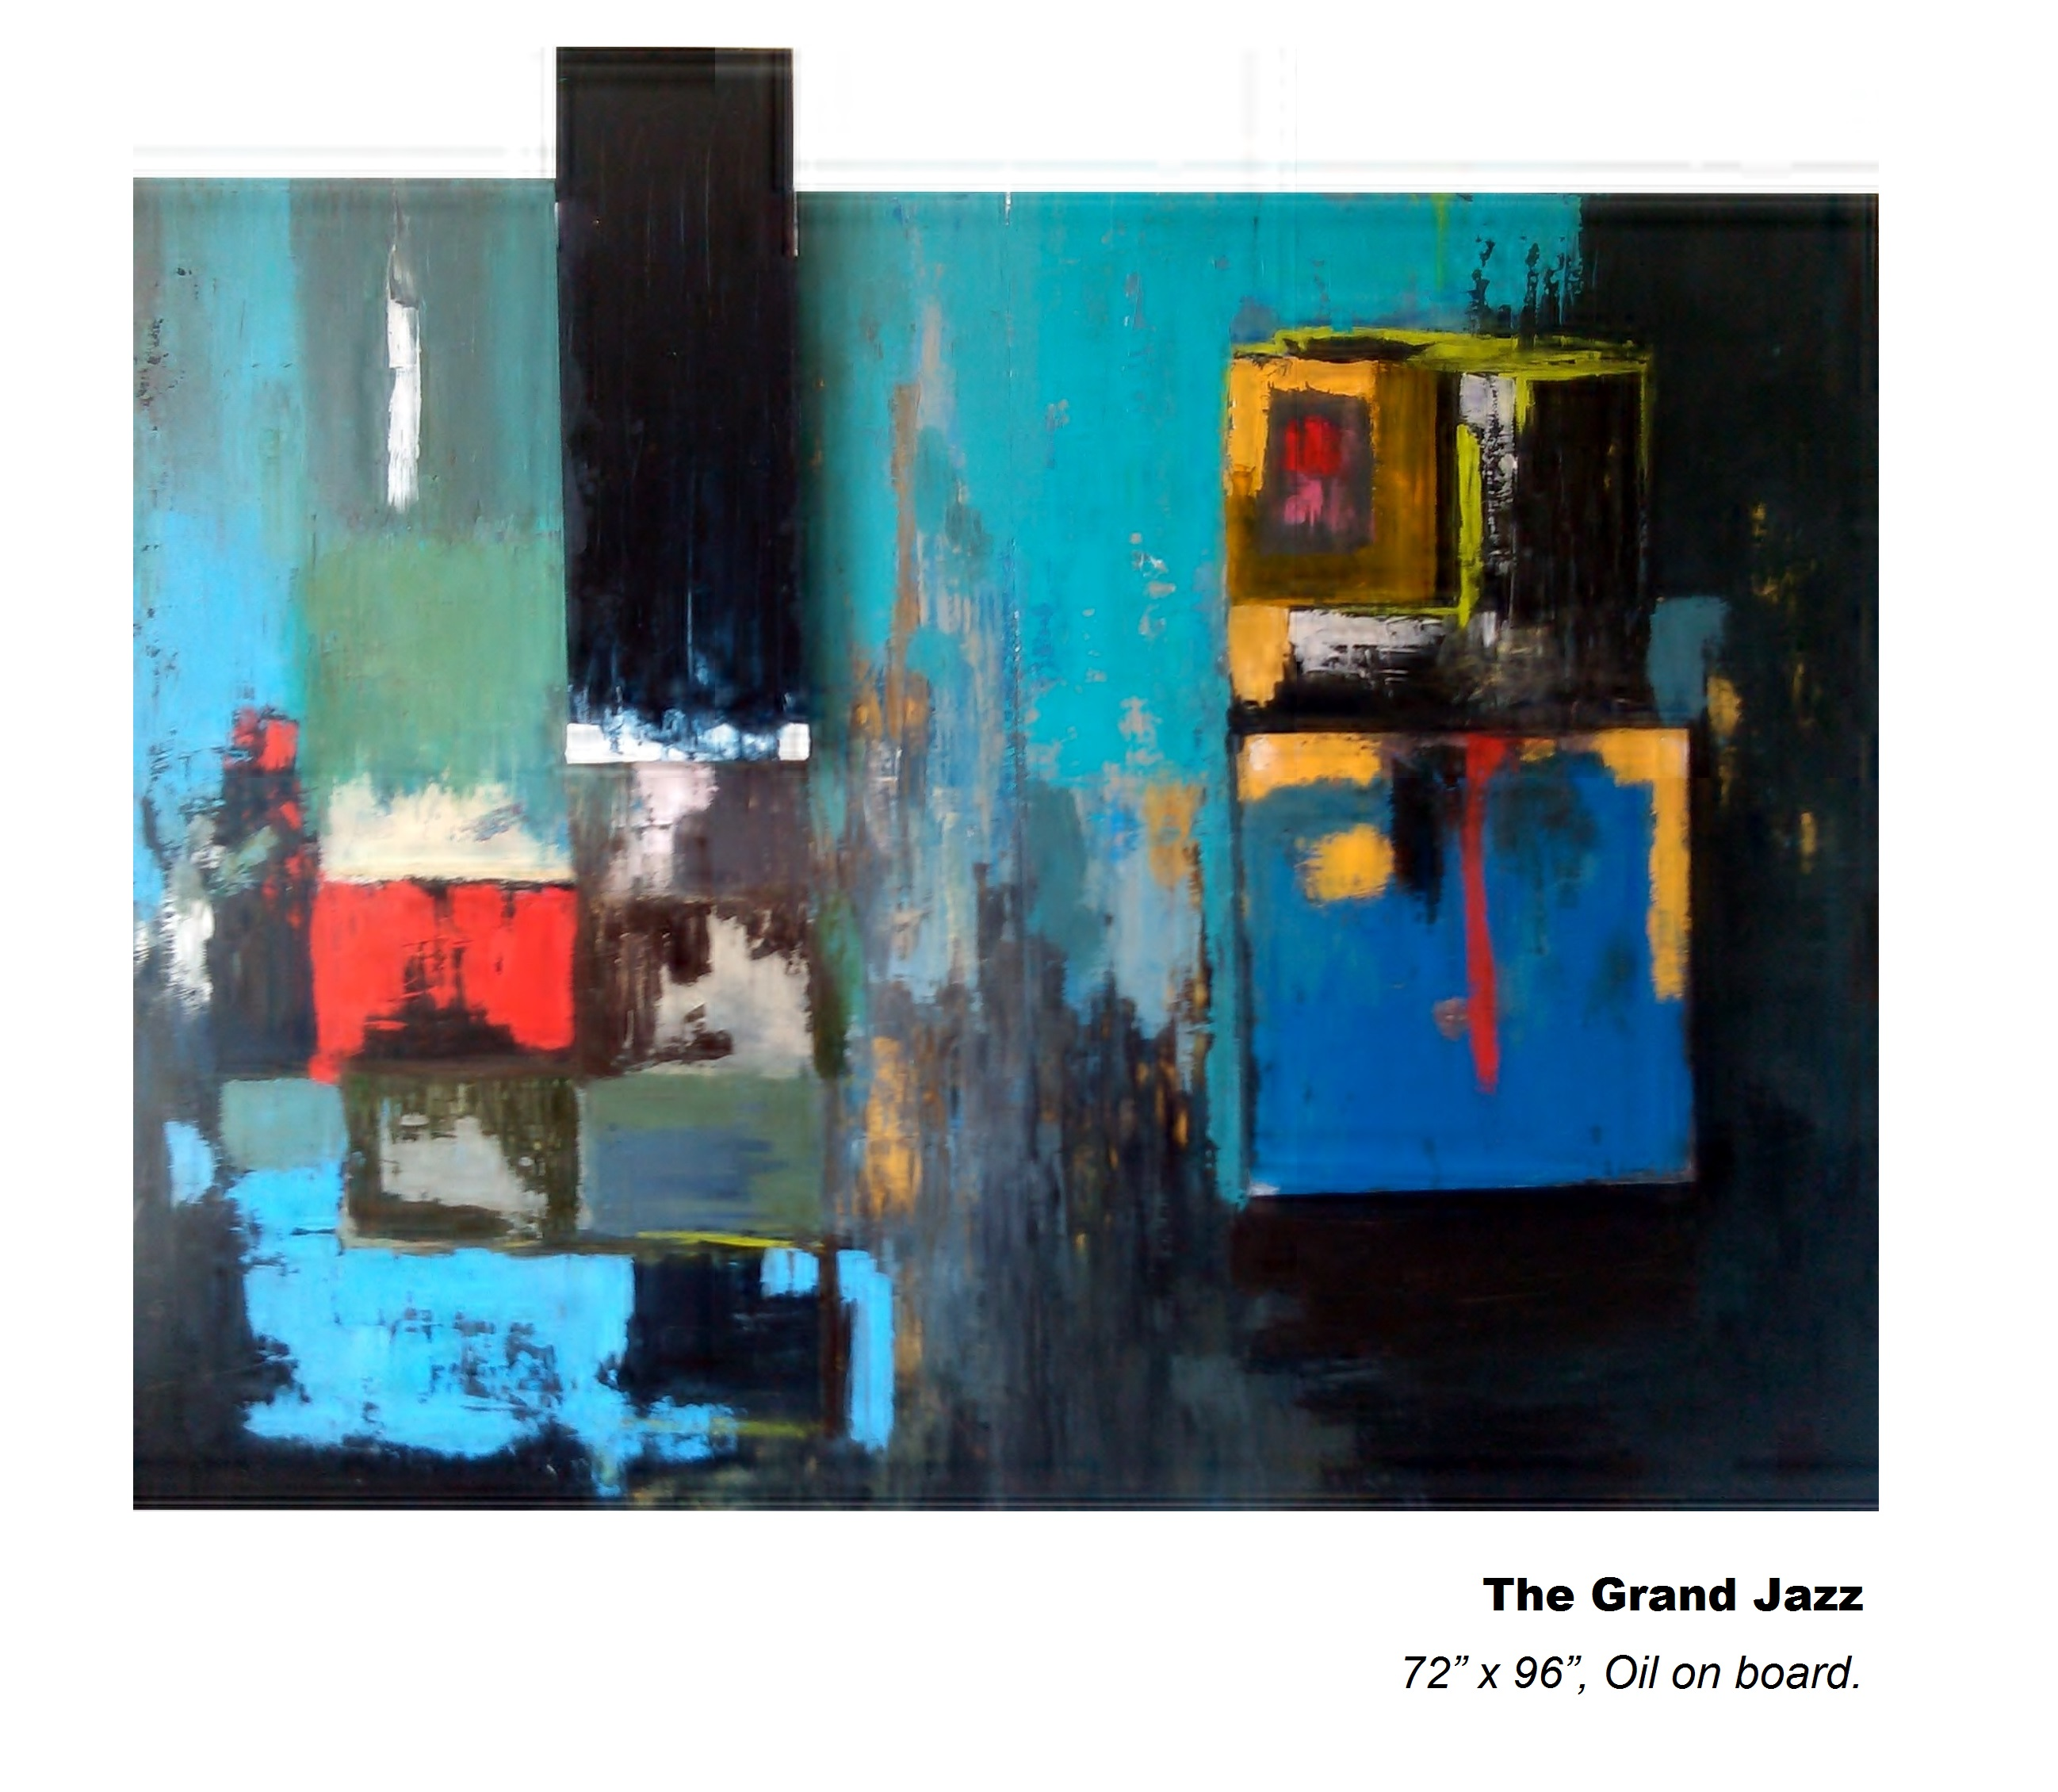 The Grand Jazz